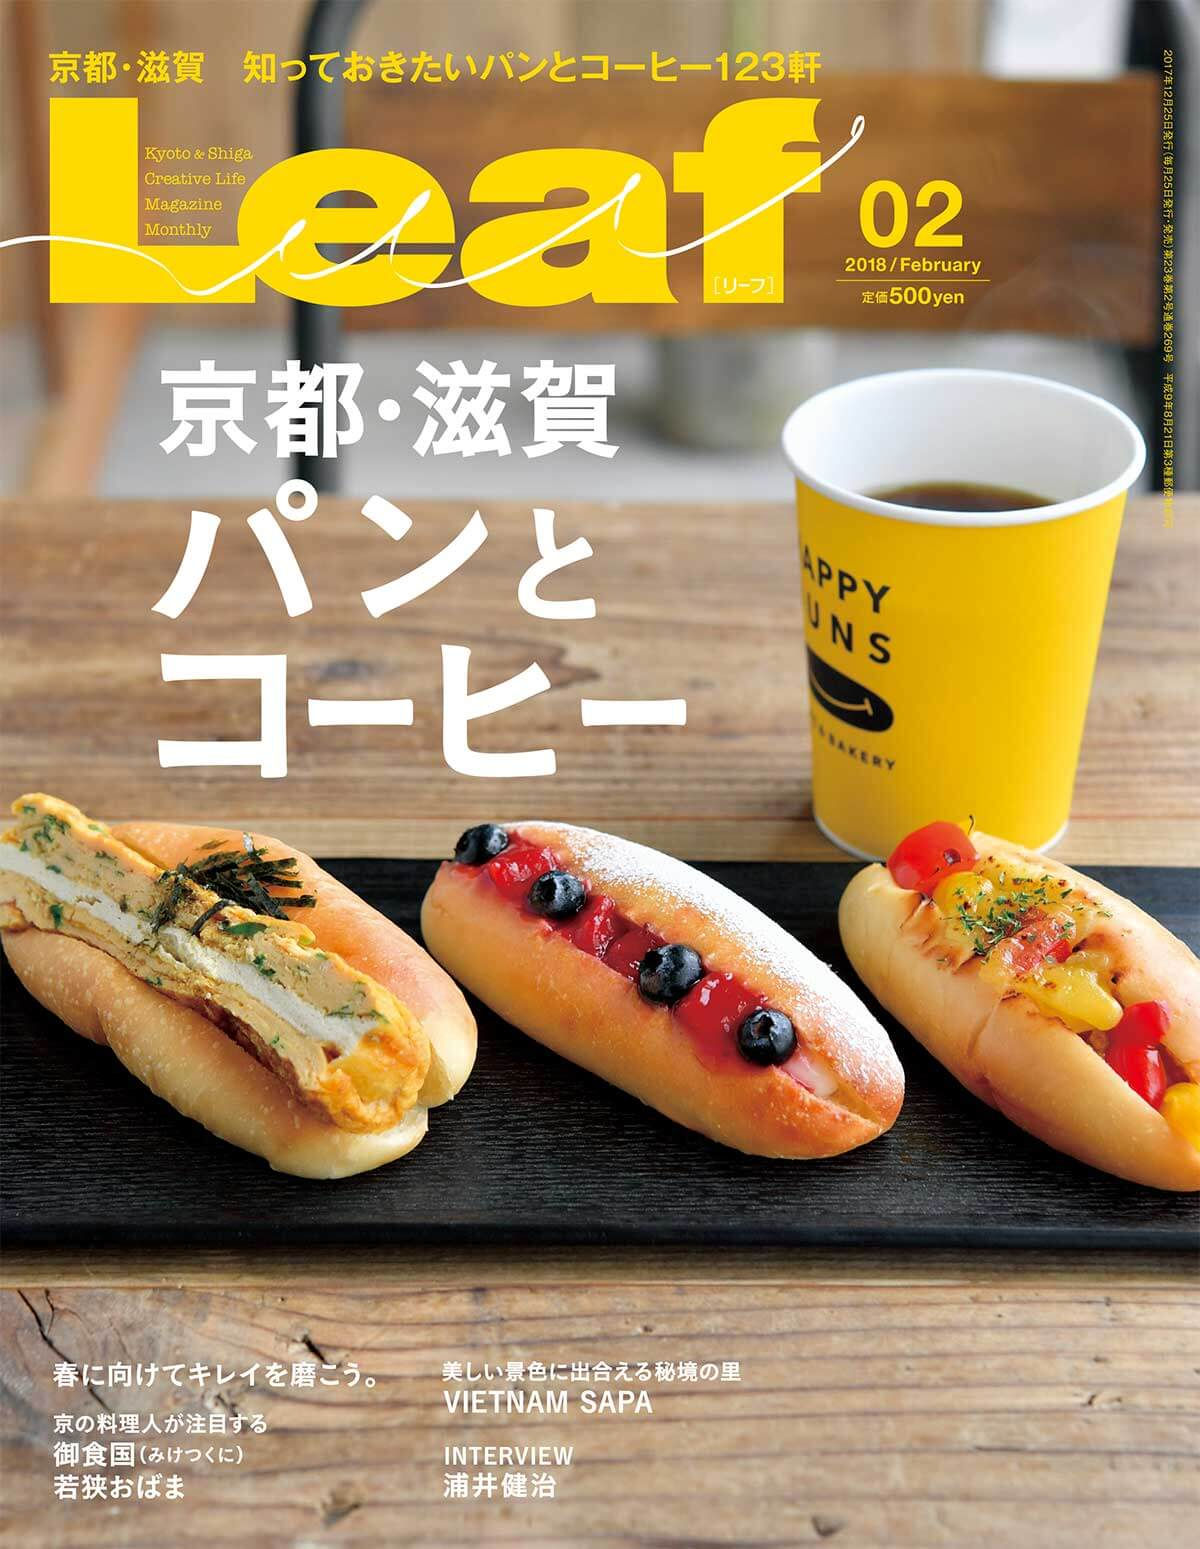 Leaf - 京都・滋賀パン&コーヒー